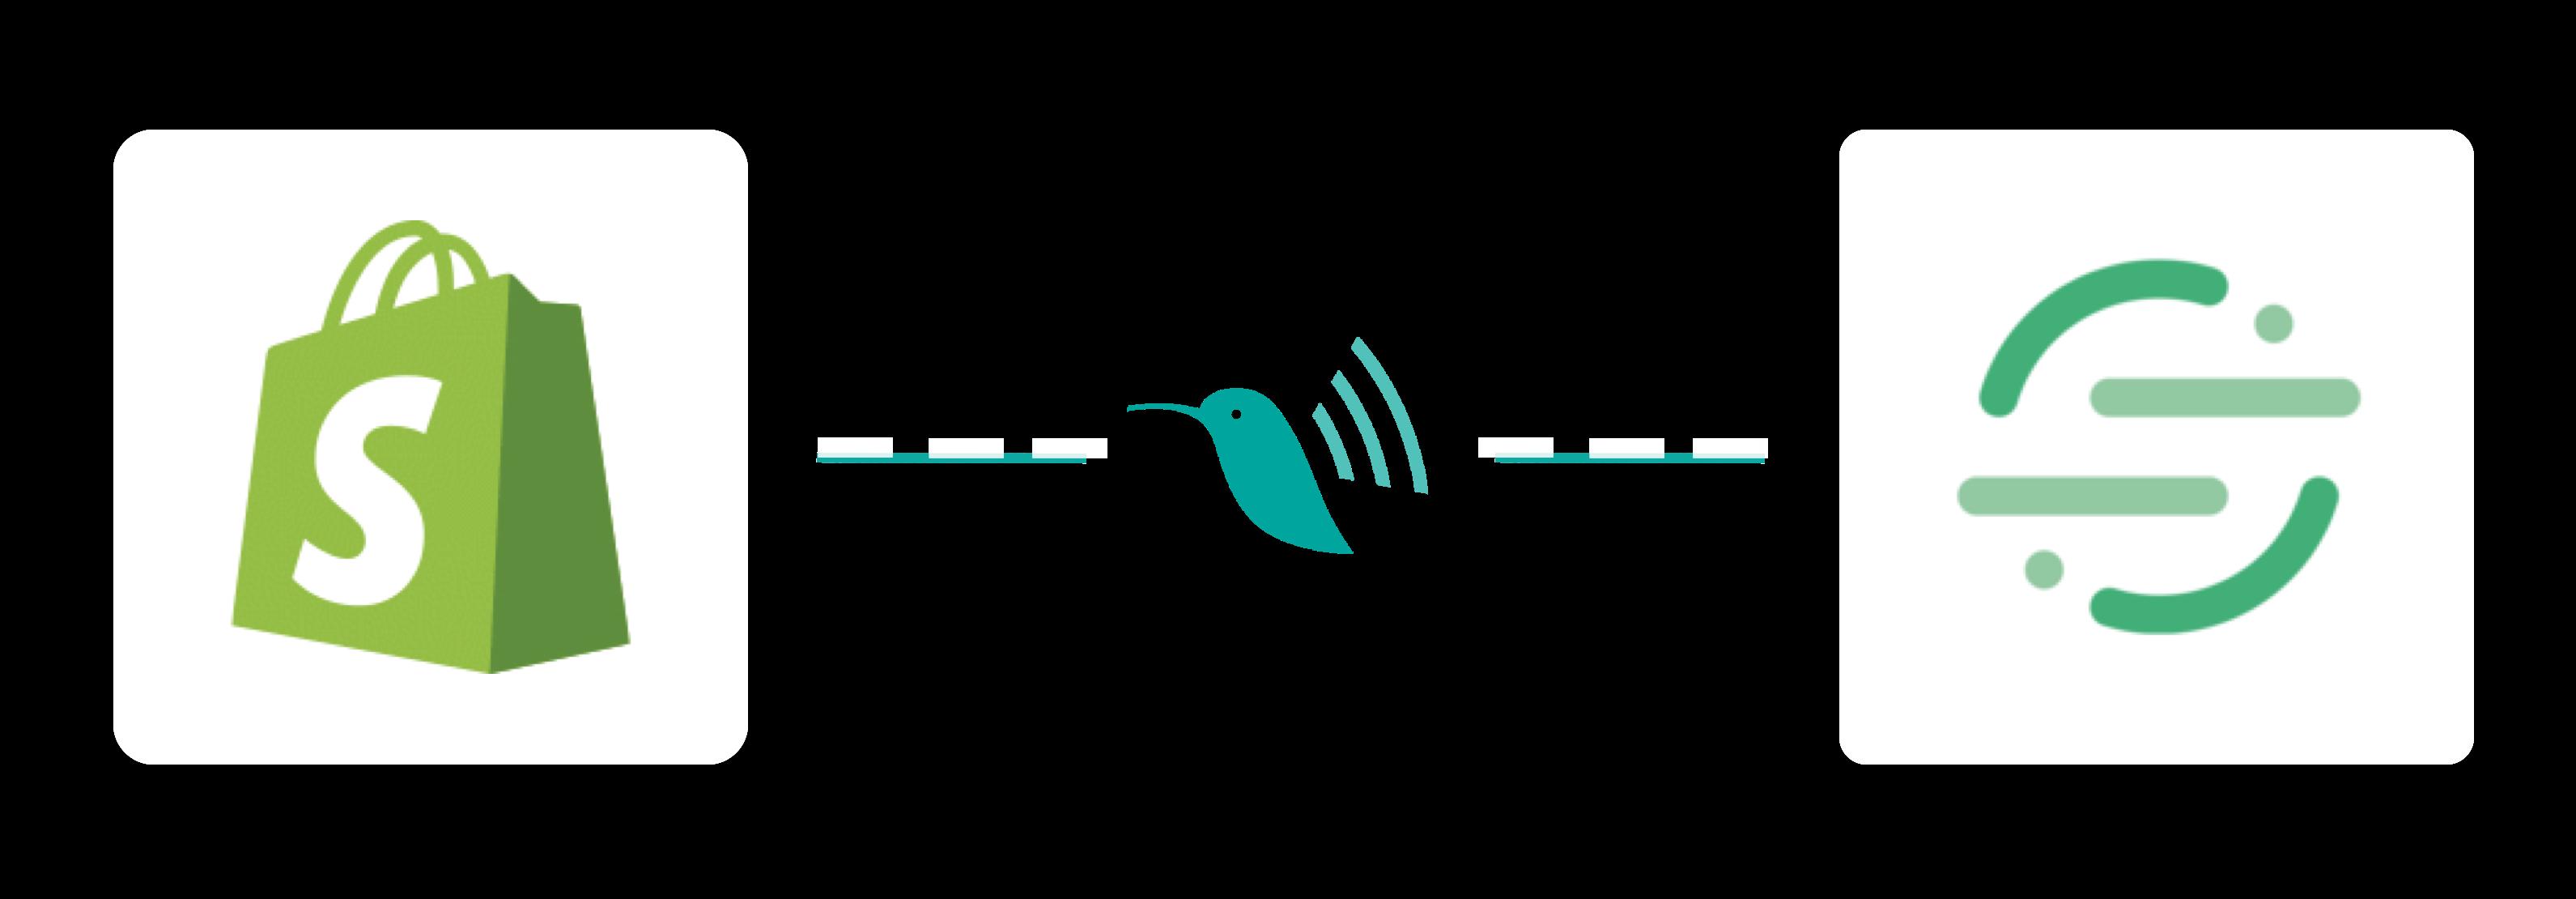 Connect Shopify to Segment via Littledata